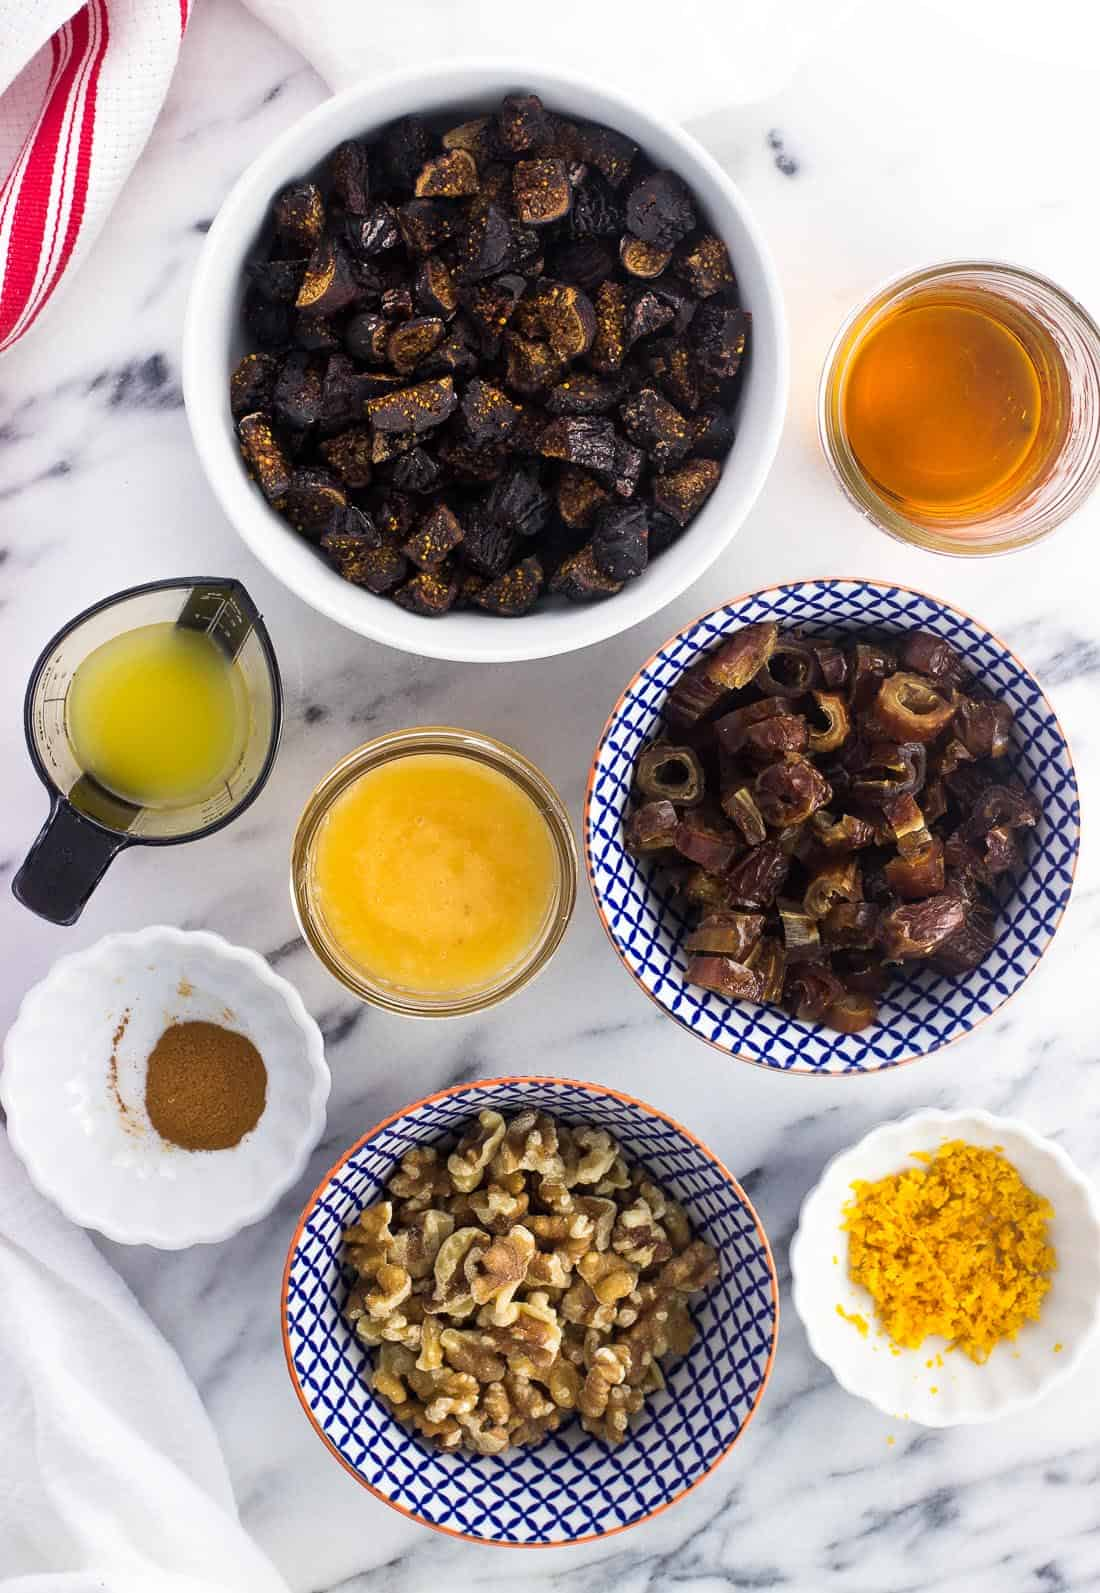 Cucidati ingredients in separate bowls on a marble board